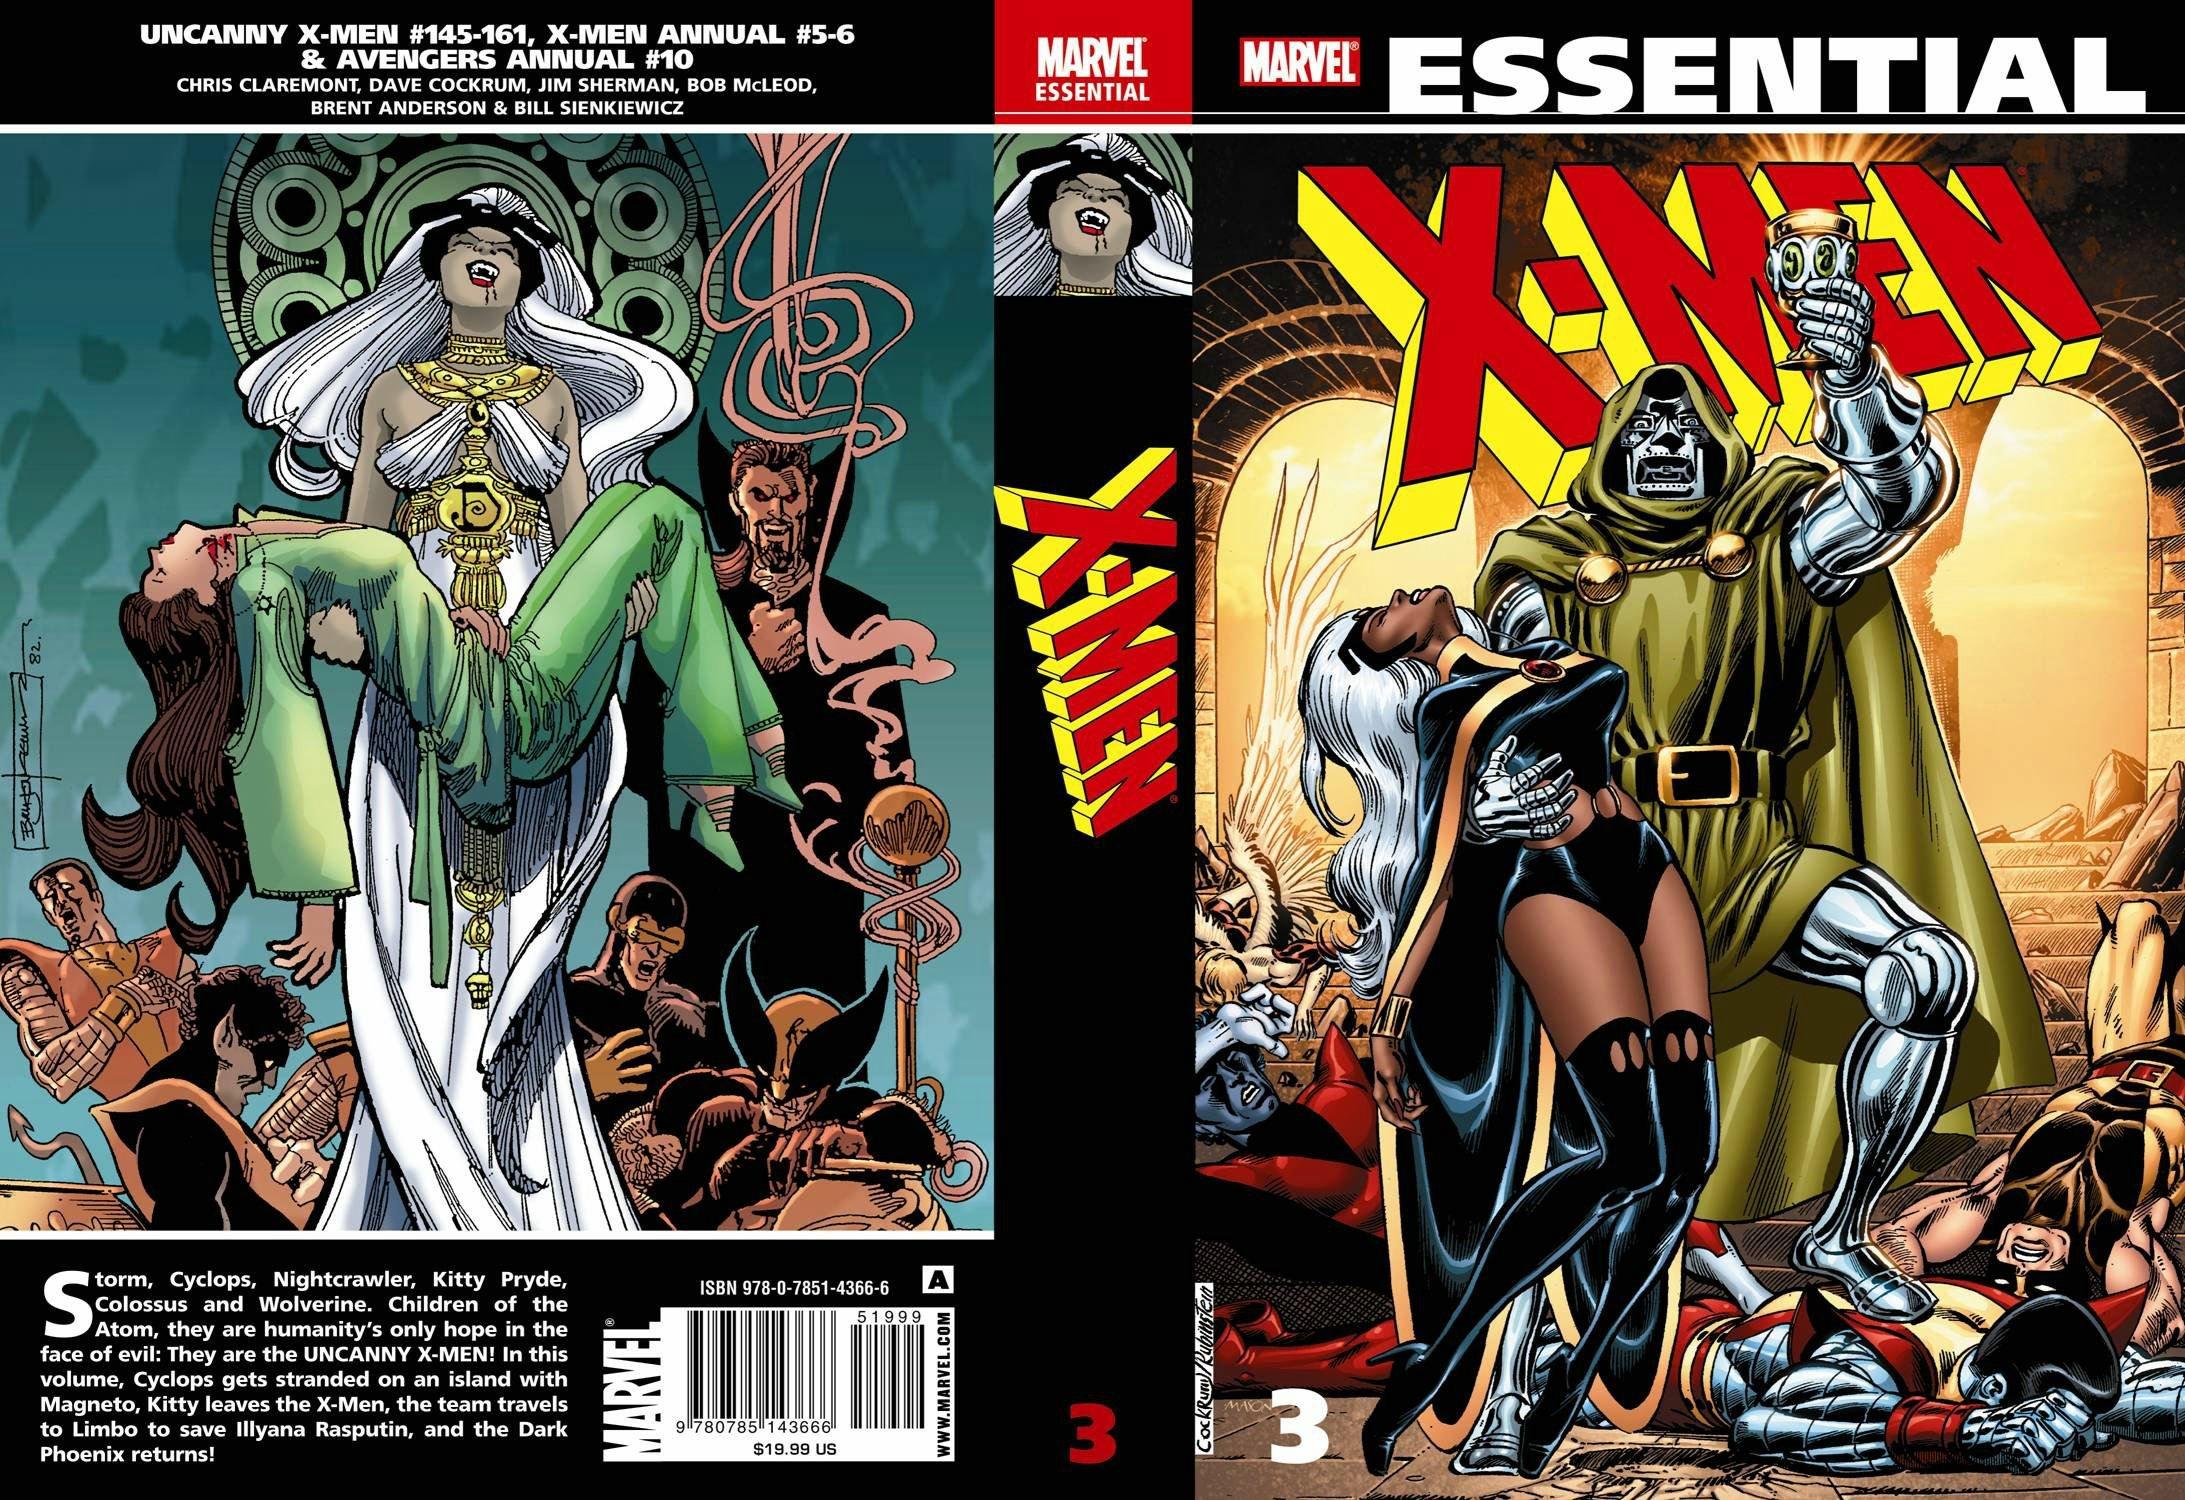 Essential X Men 3 All New Edition 9780785143666 Chris Claremont Dave Cockrum Jim Sherman Bob Mcleod Bill Sienkiewicz Brent Anderson Books